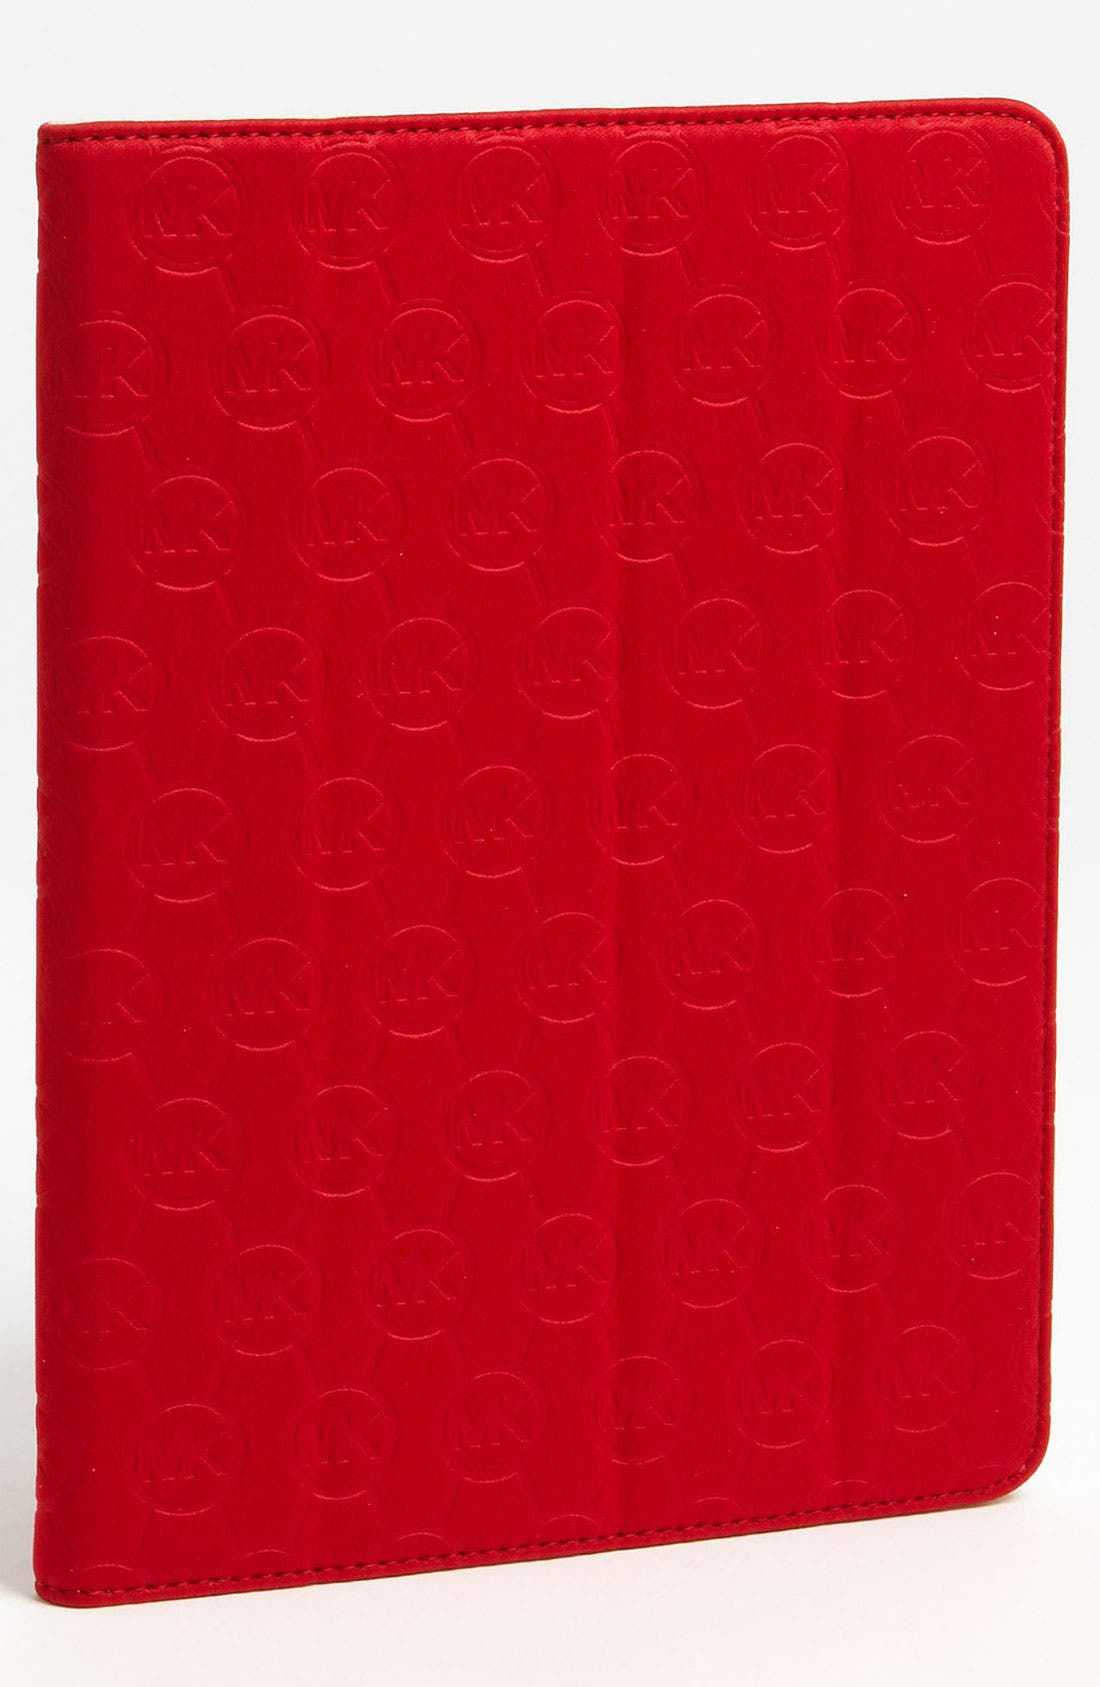 Alternate Image 1 Selected - MICHAEL Michael Kors 'Sweet Sleeve' iPad 2 Case